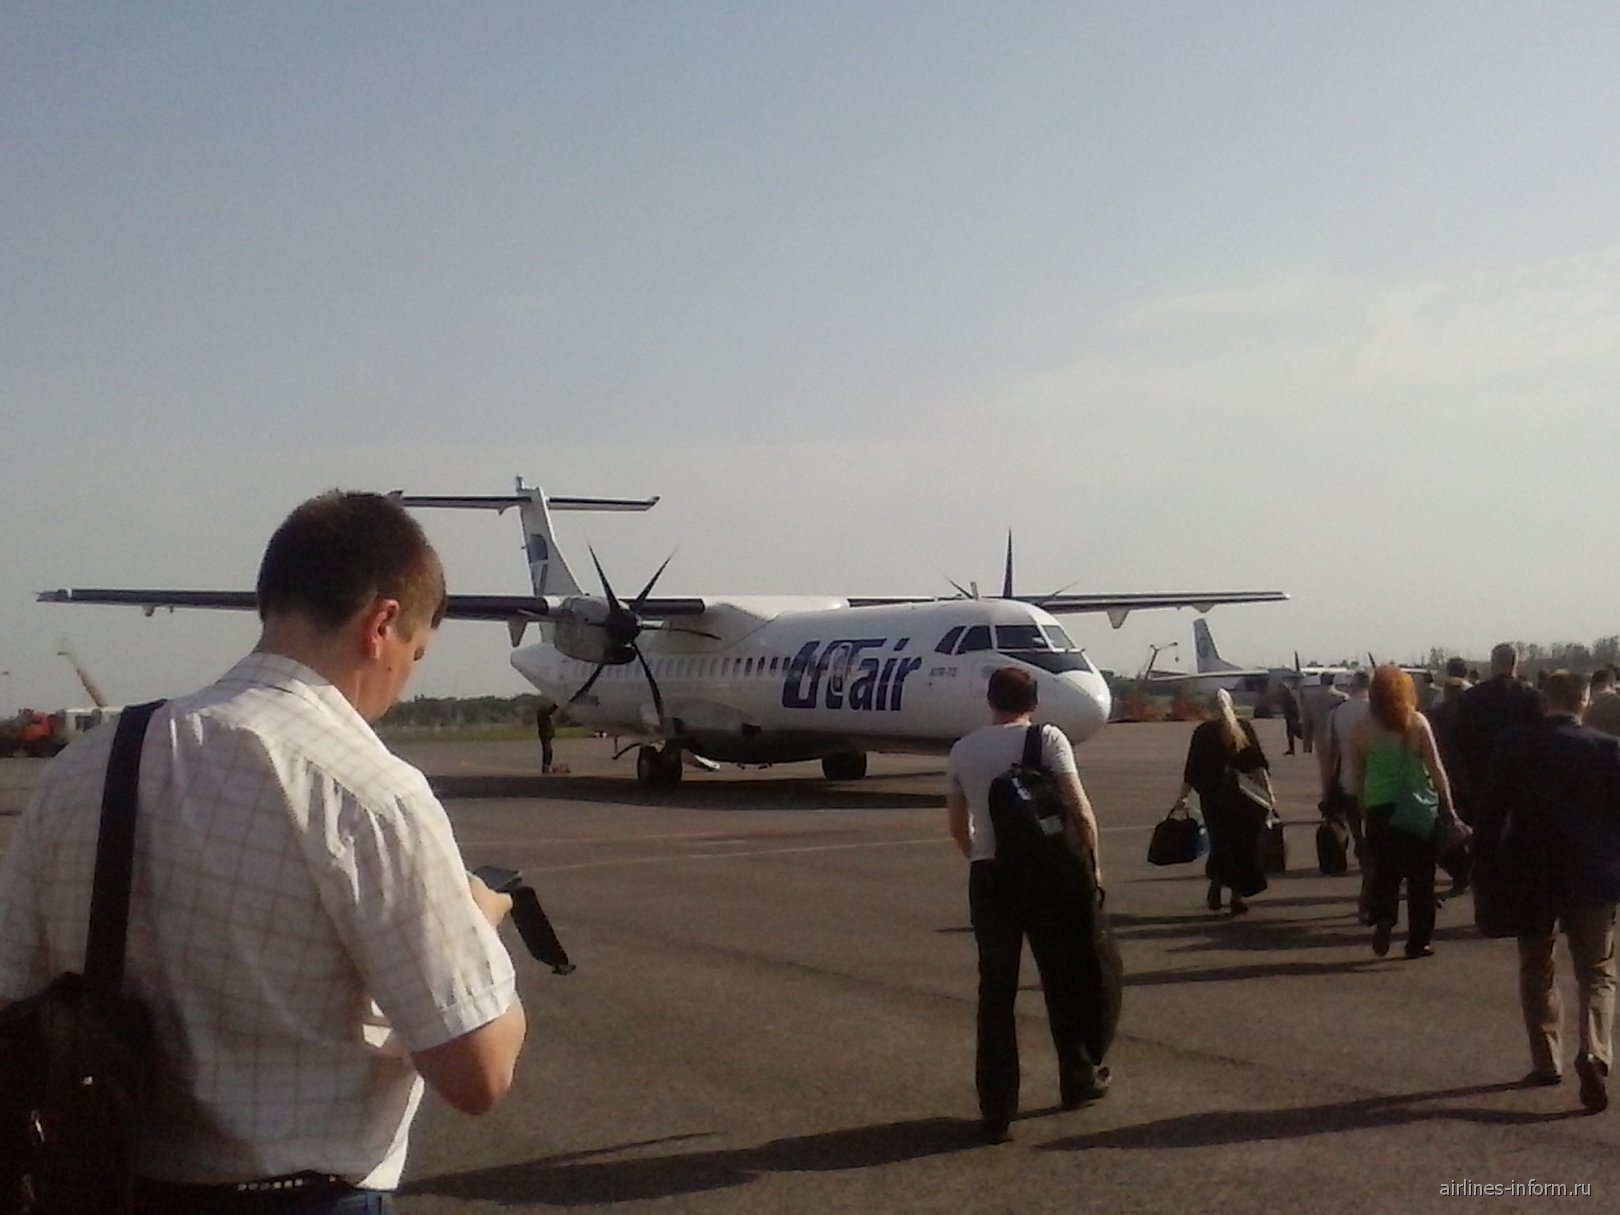 Рейс Тамбов-Москва авиакомпании ЮТэйр